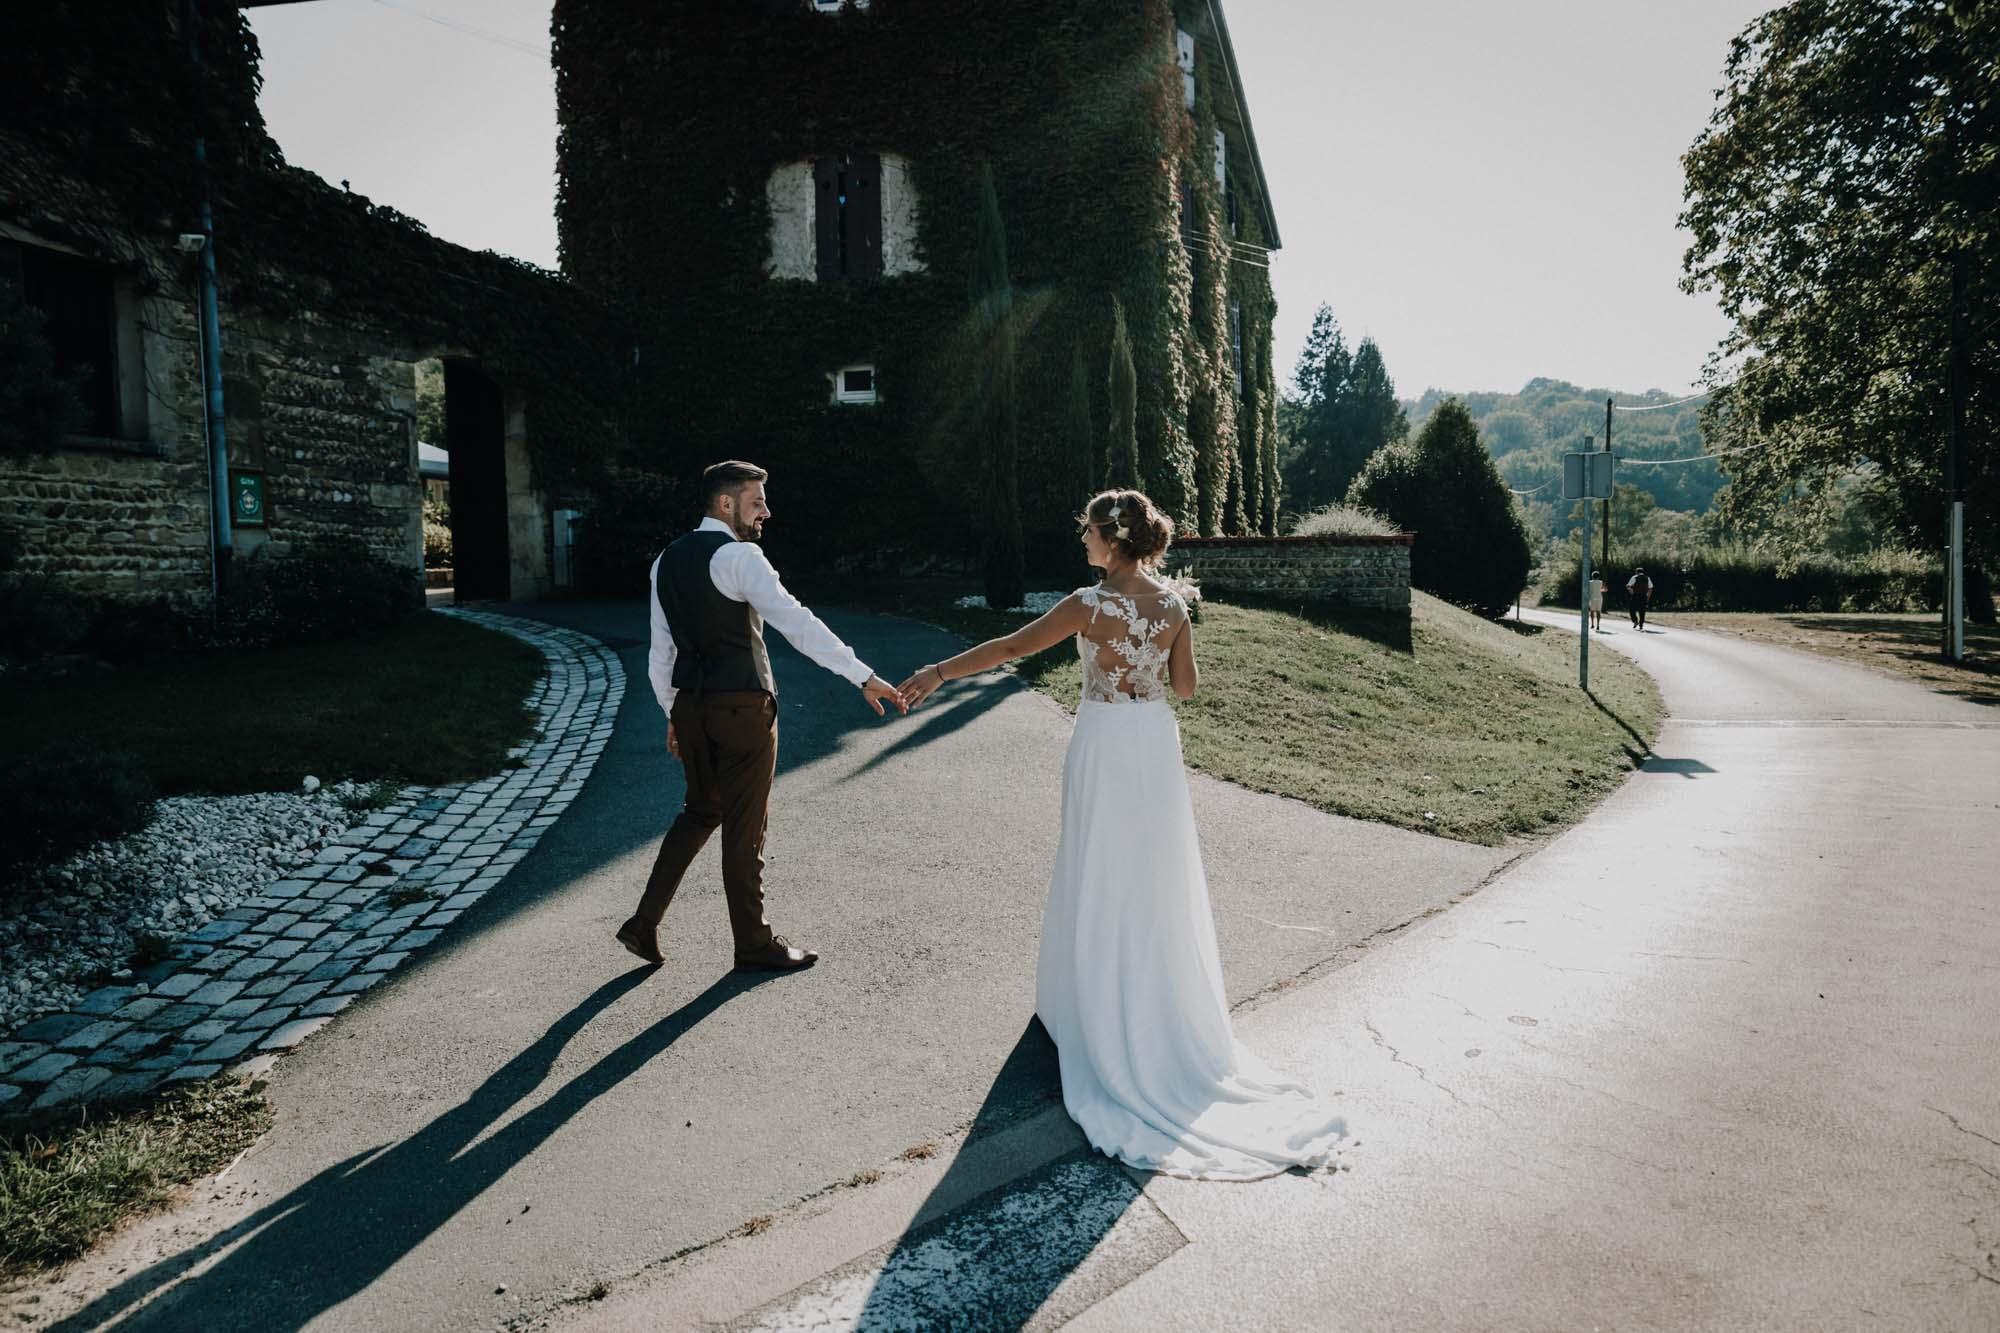 2018-09-29 - LD8_1143 - photographe mariage lyon - laurie diaz - www.lauriediazweeding.com.jpg